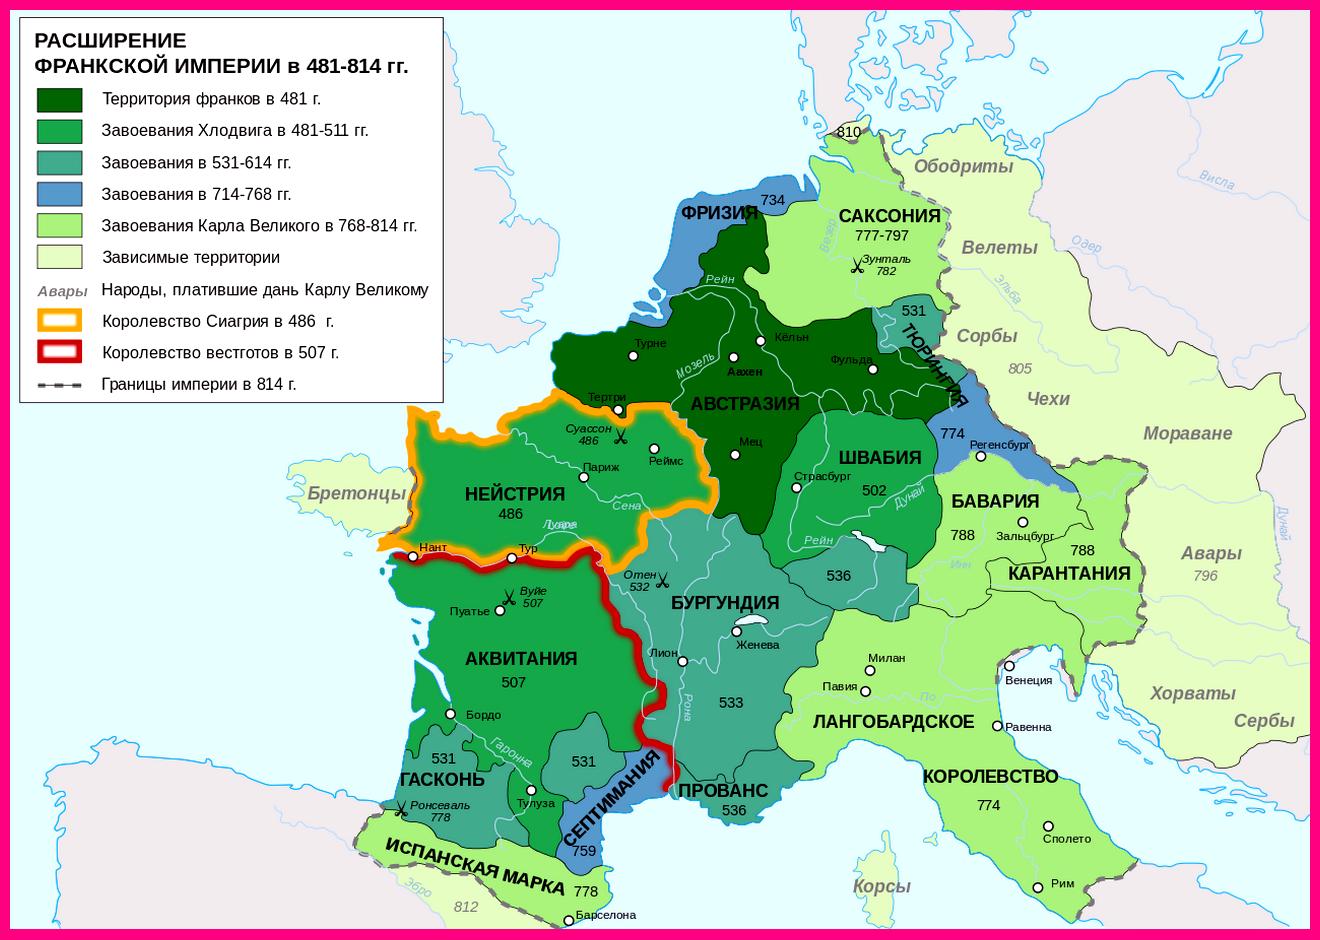 Франкское государство при Карле